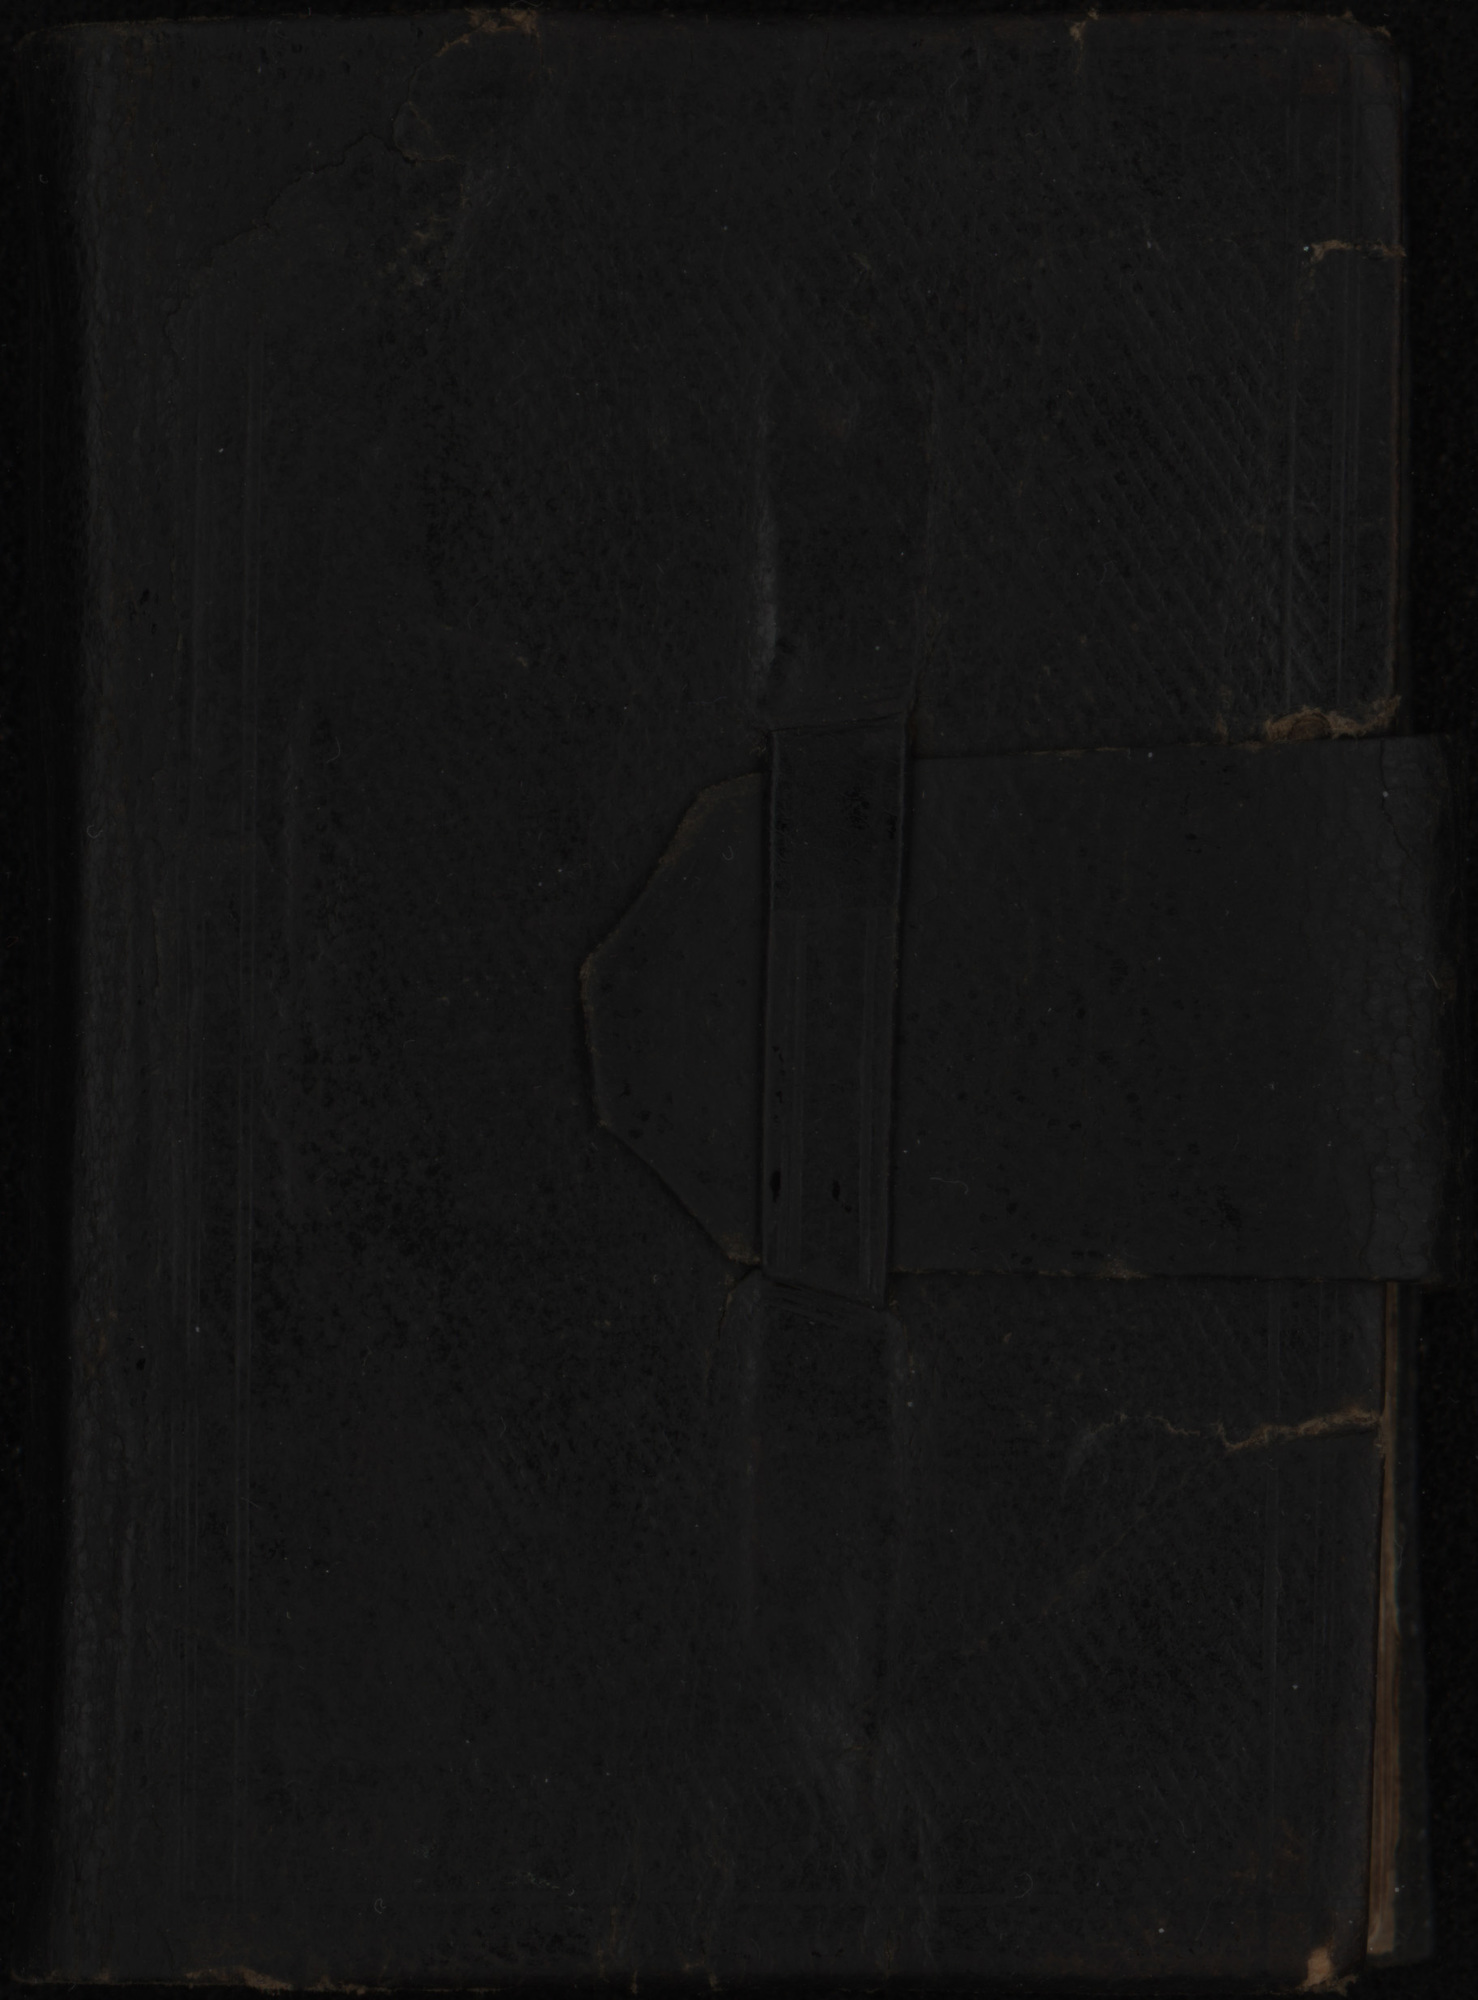 Ms2012-075_BarnettWilliamW_Diary_1862_frontcover.jpg